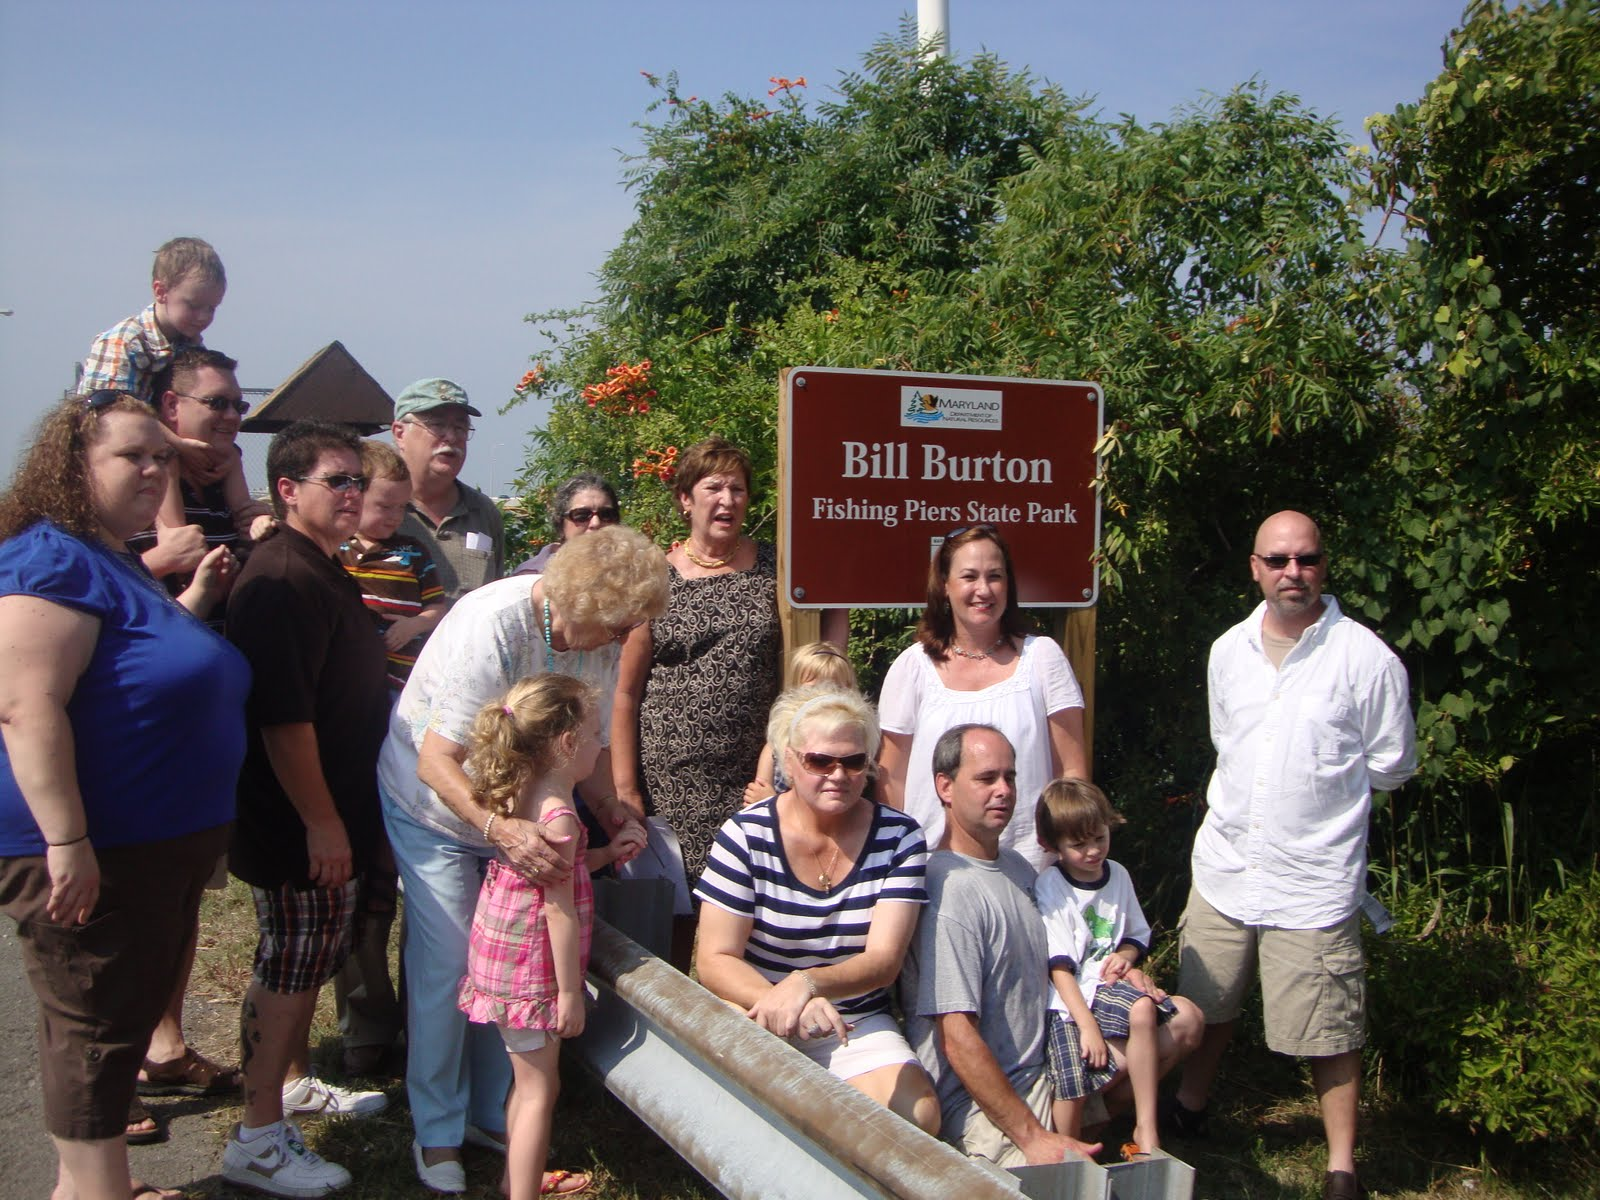 Green team gazette july 2010 for Bill burton fishing pier state park